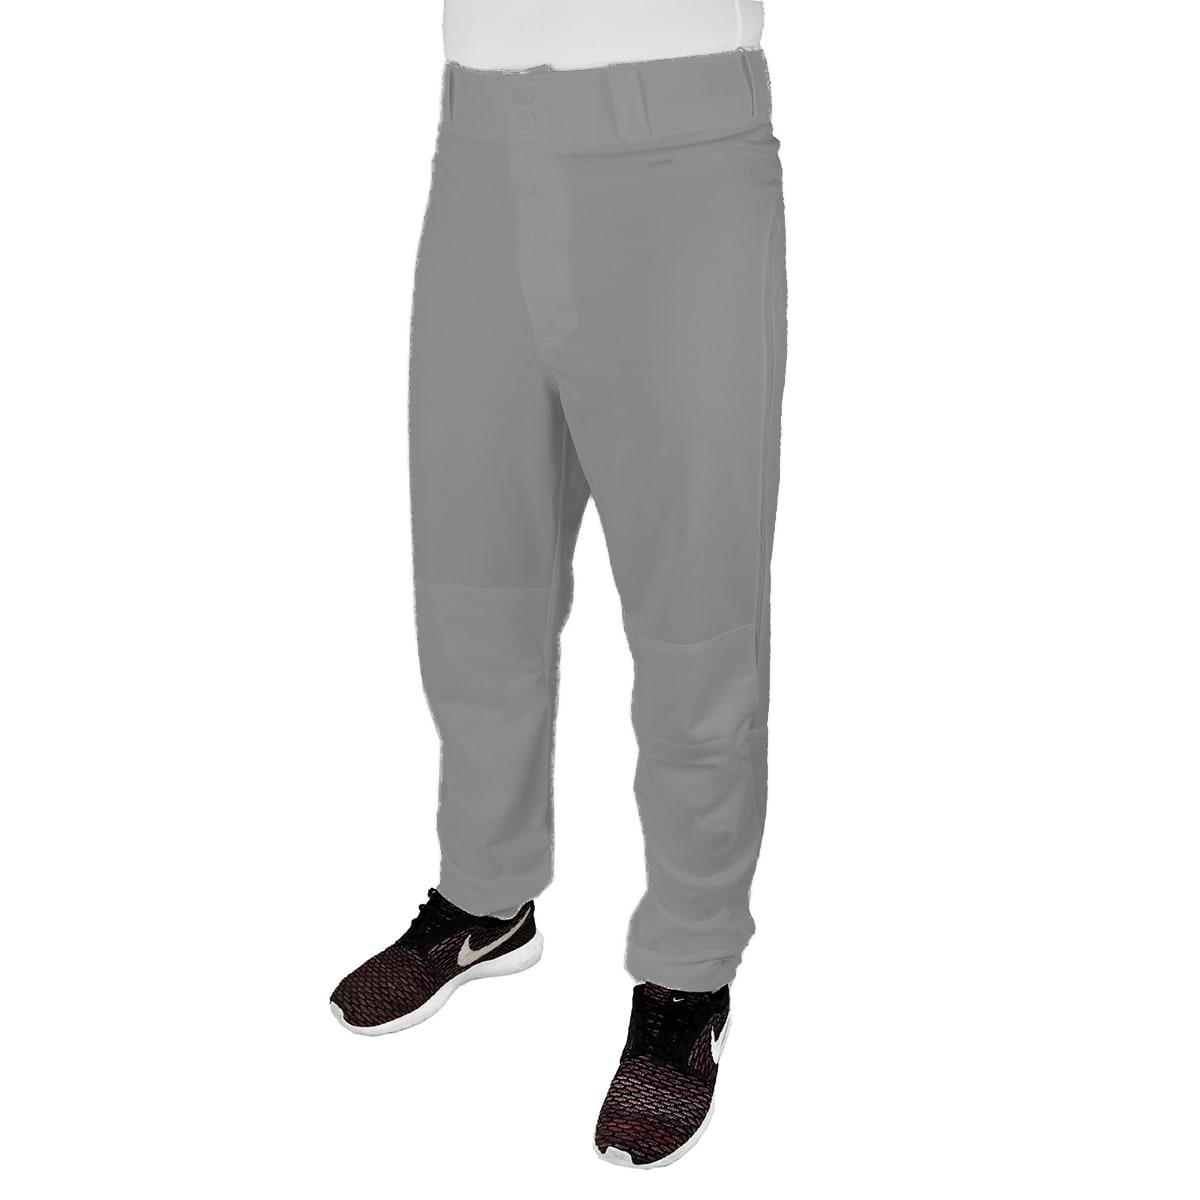 b5e8a15edc05 Nike Athletic Clothing